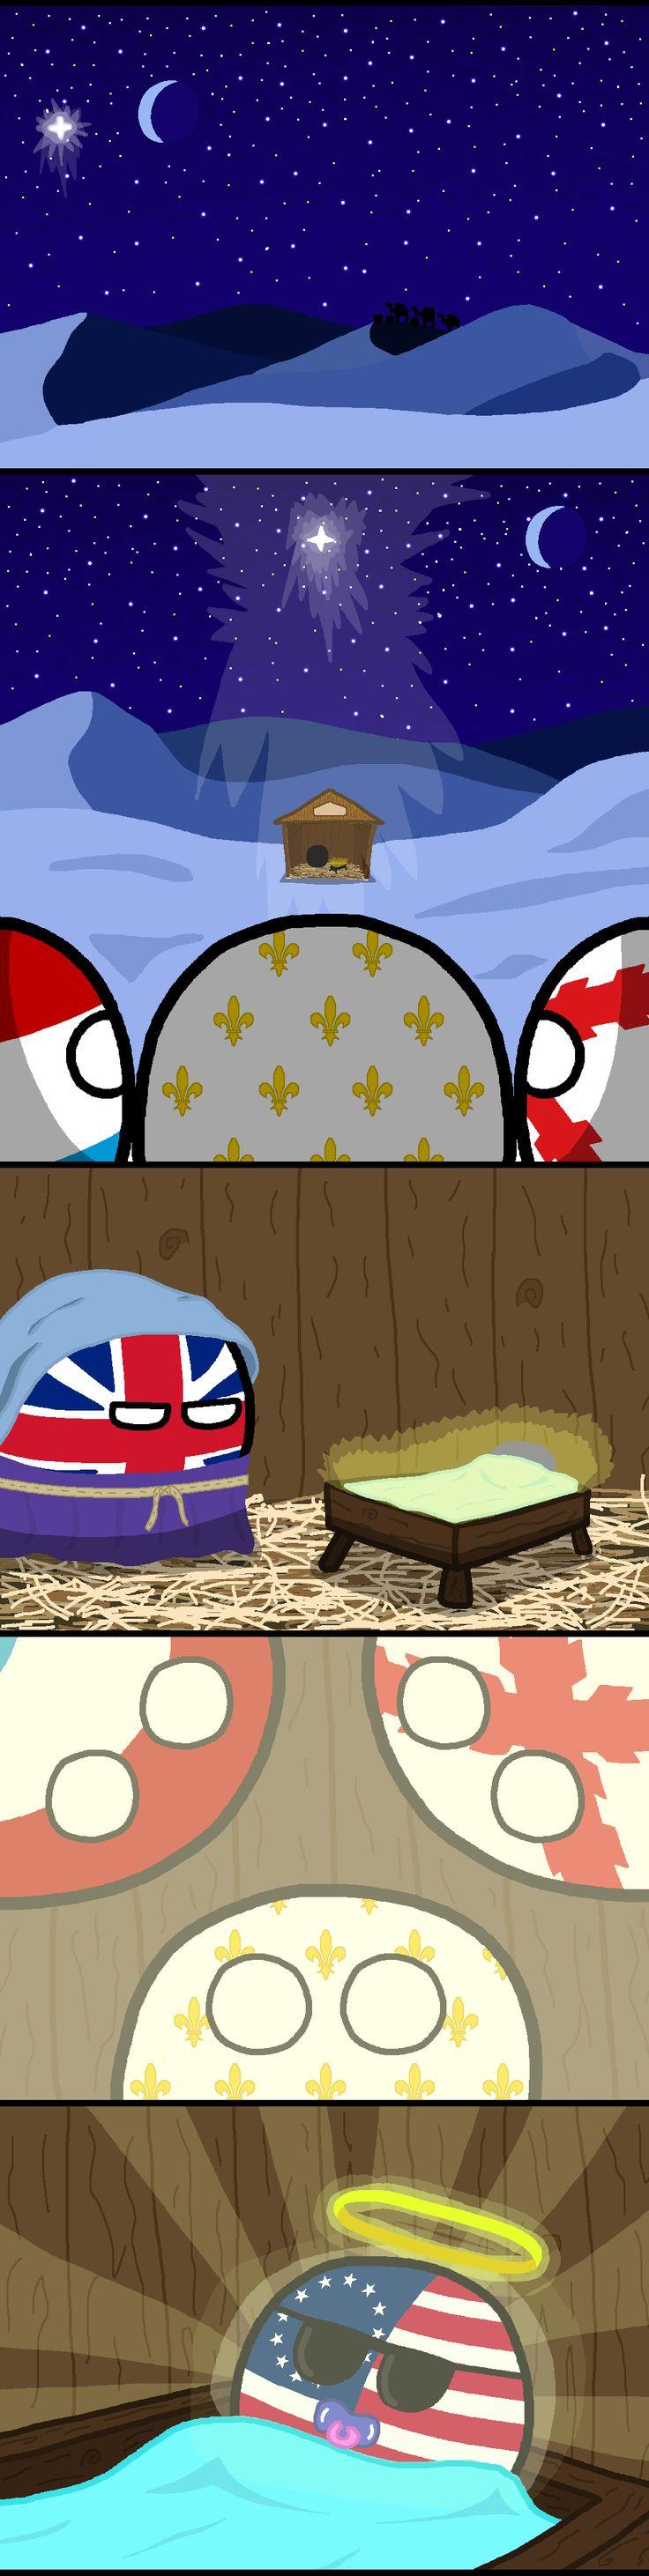 The Birth of a Nation ( USA, UK, Netherlands, Spain, France ) by Baron koleye of kolaje #polandball #countryball